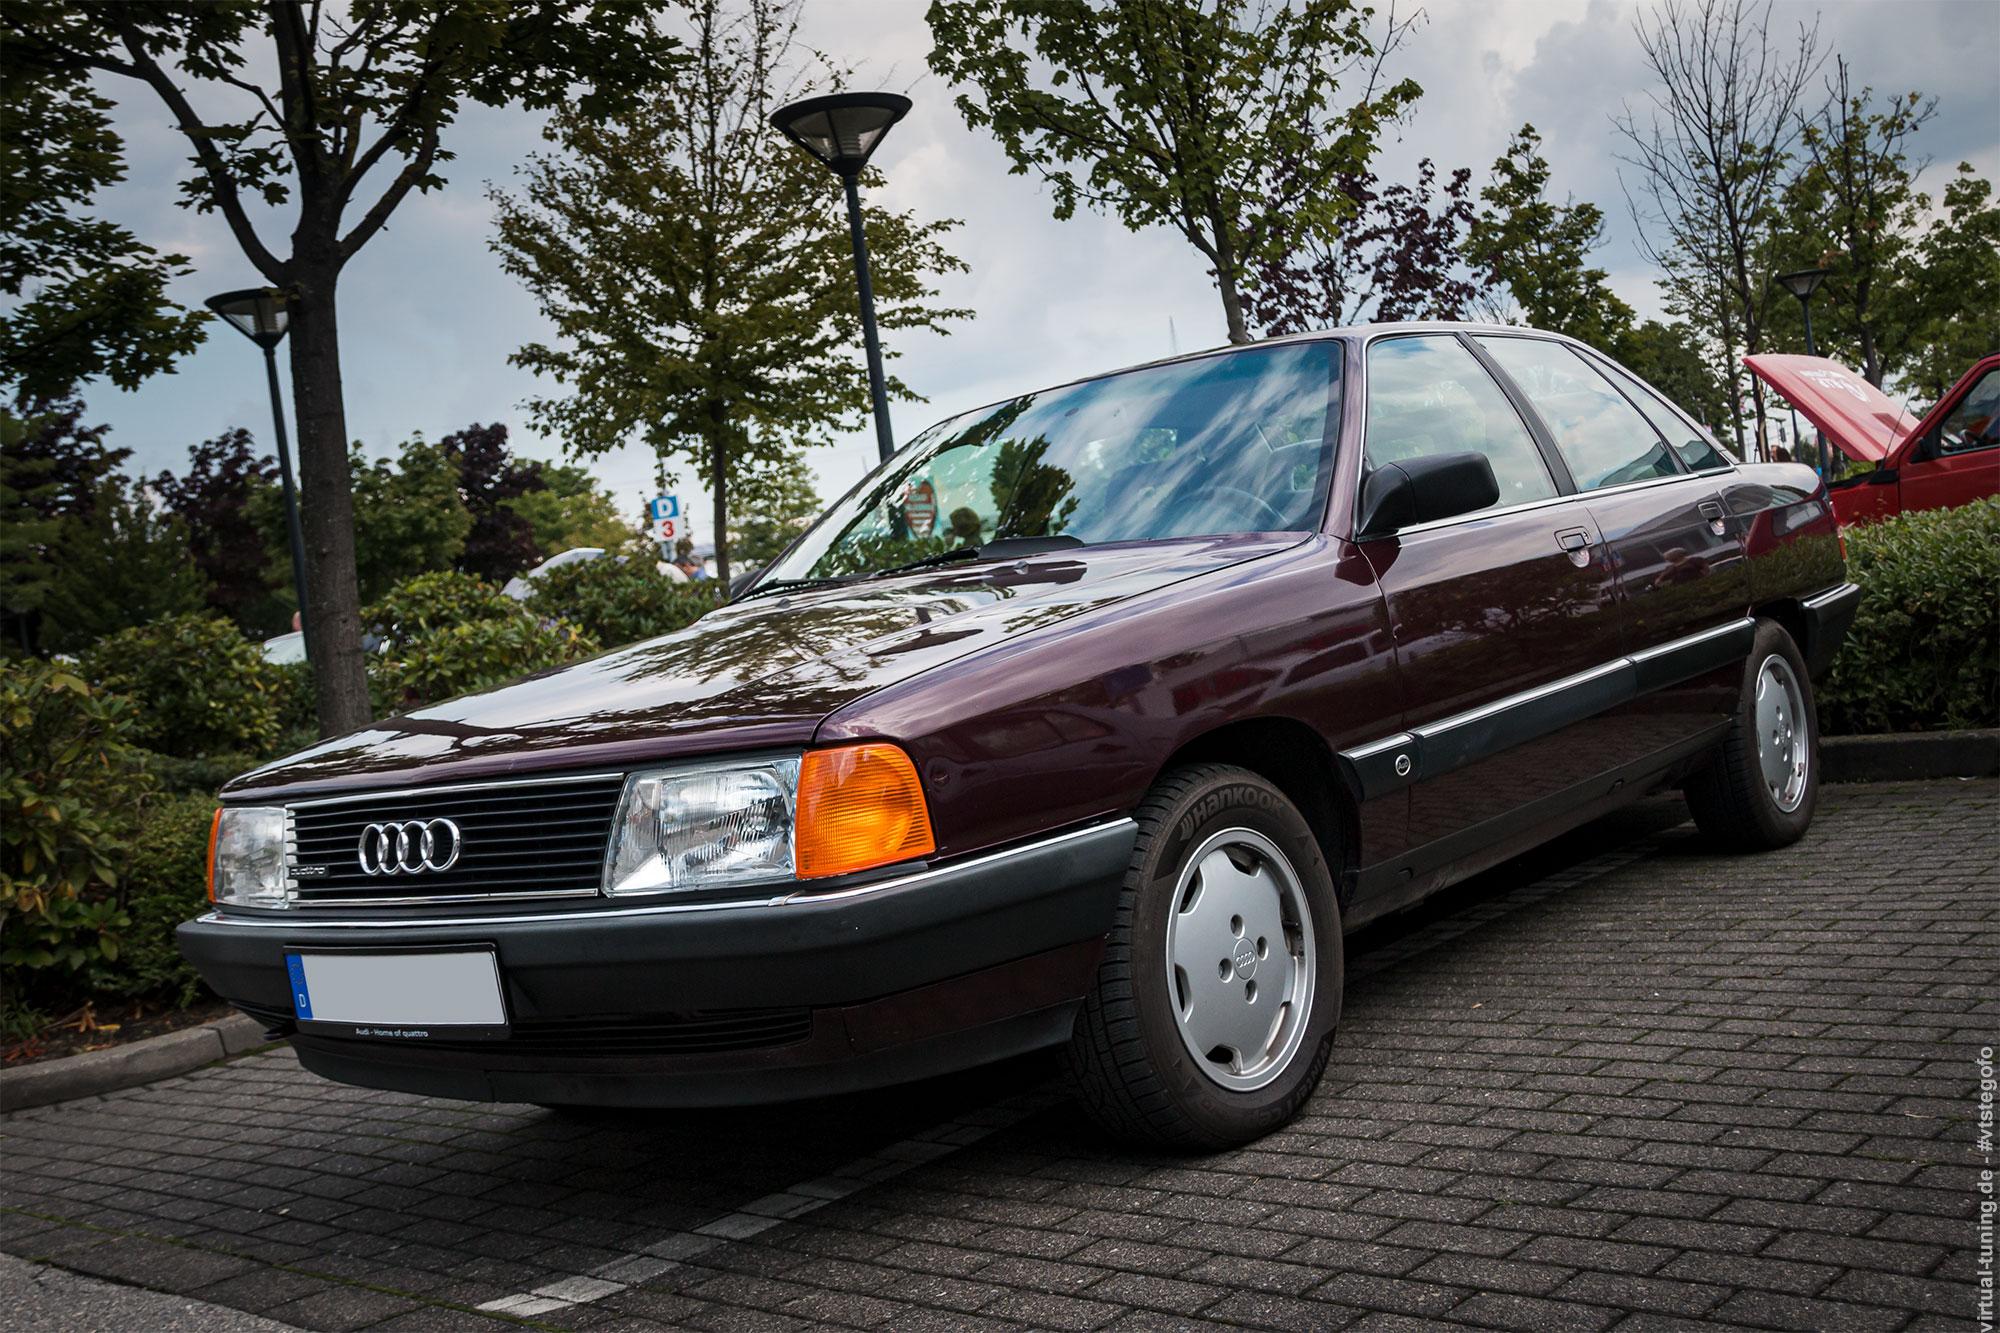 Audi 100 - 2. ADAC Youngtimertreffen-Ruhr 2017